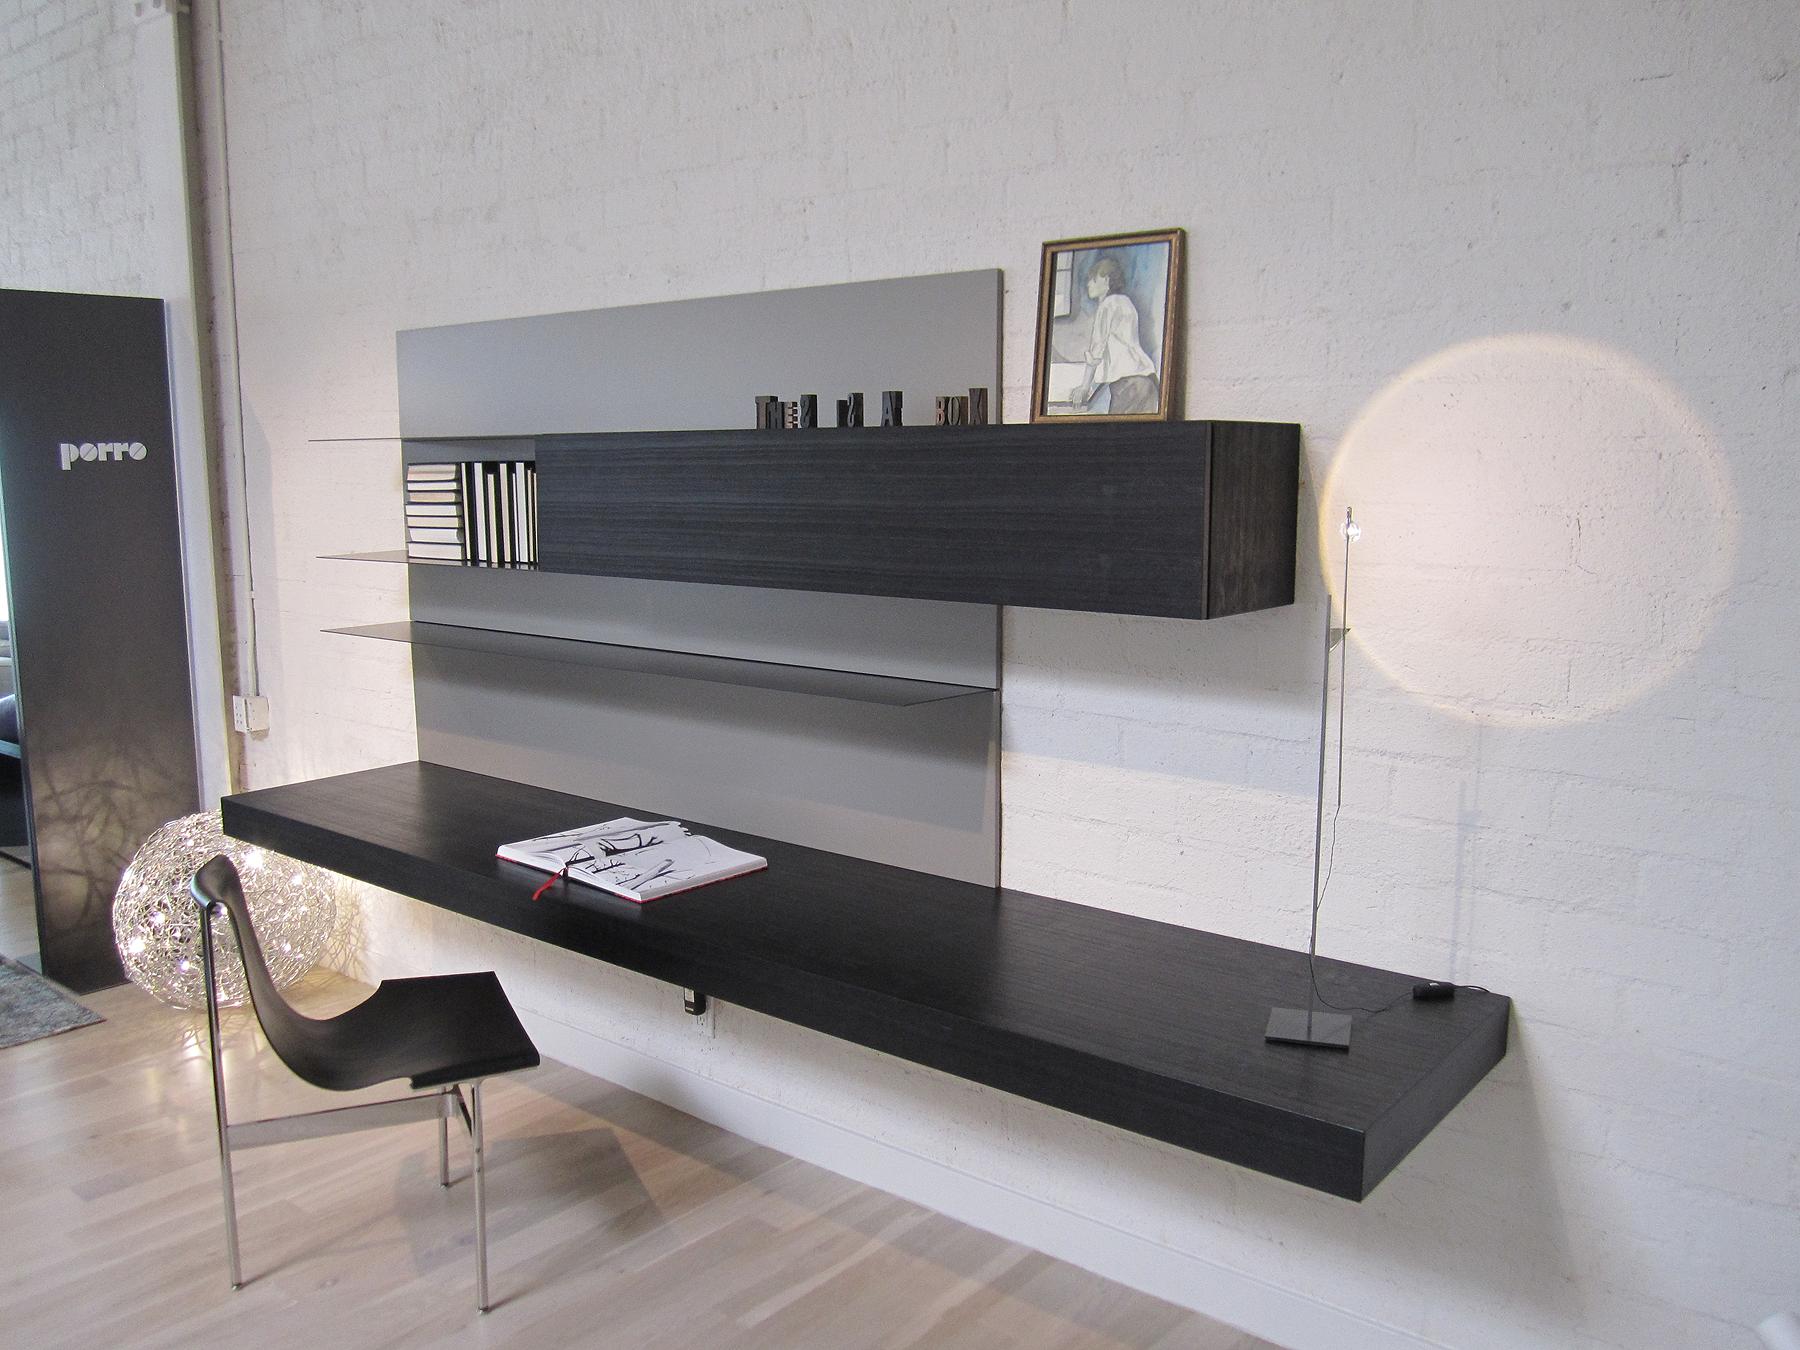 Living Room Wall Unit System Designs Desk In Living Room Living